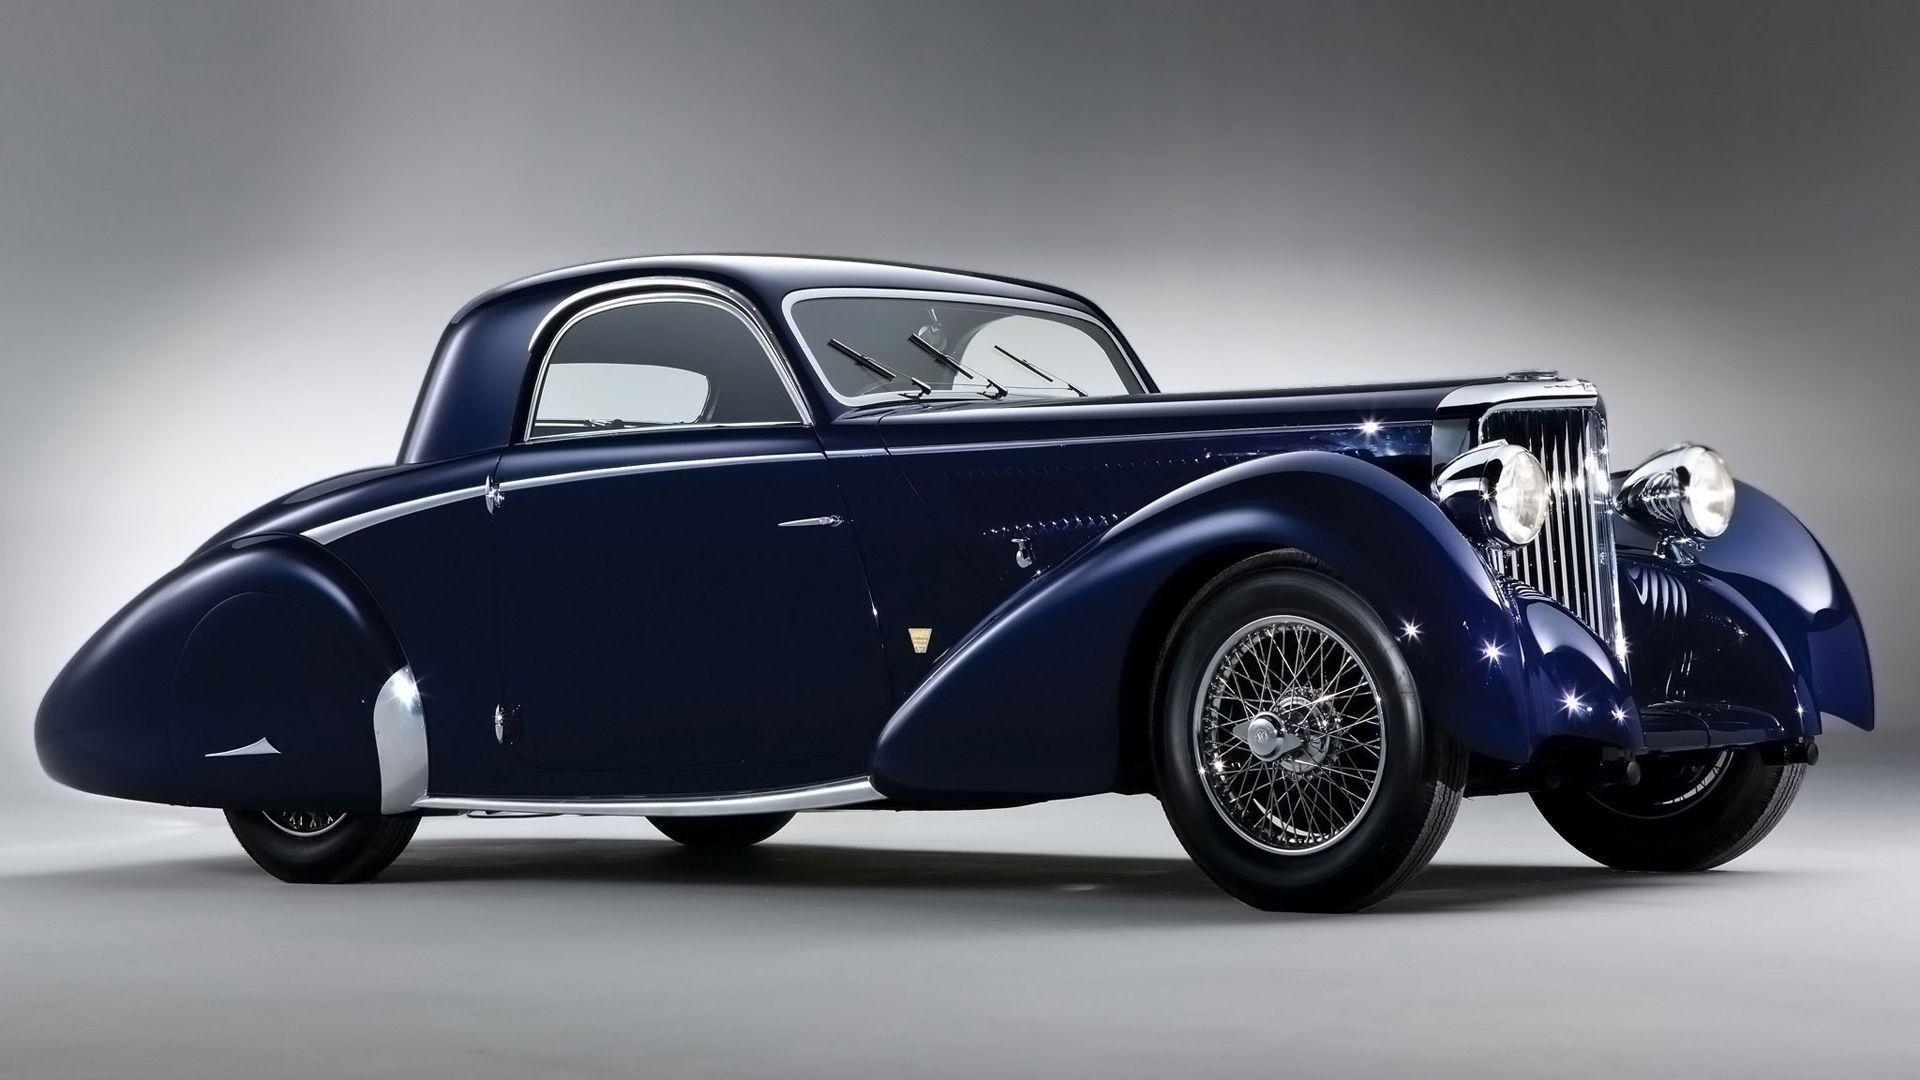 <b>Vintage Cars Wallpapers</b> Hd For <b>Desktop</b> - Auto Soletcshat Image ...